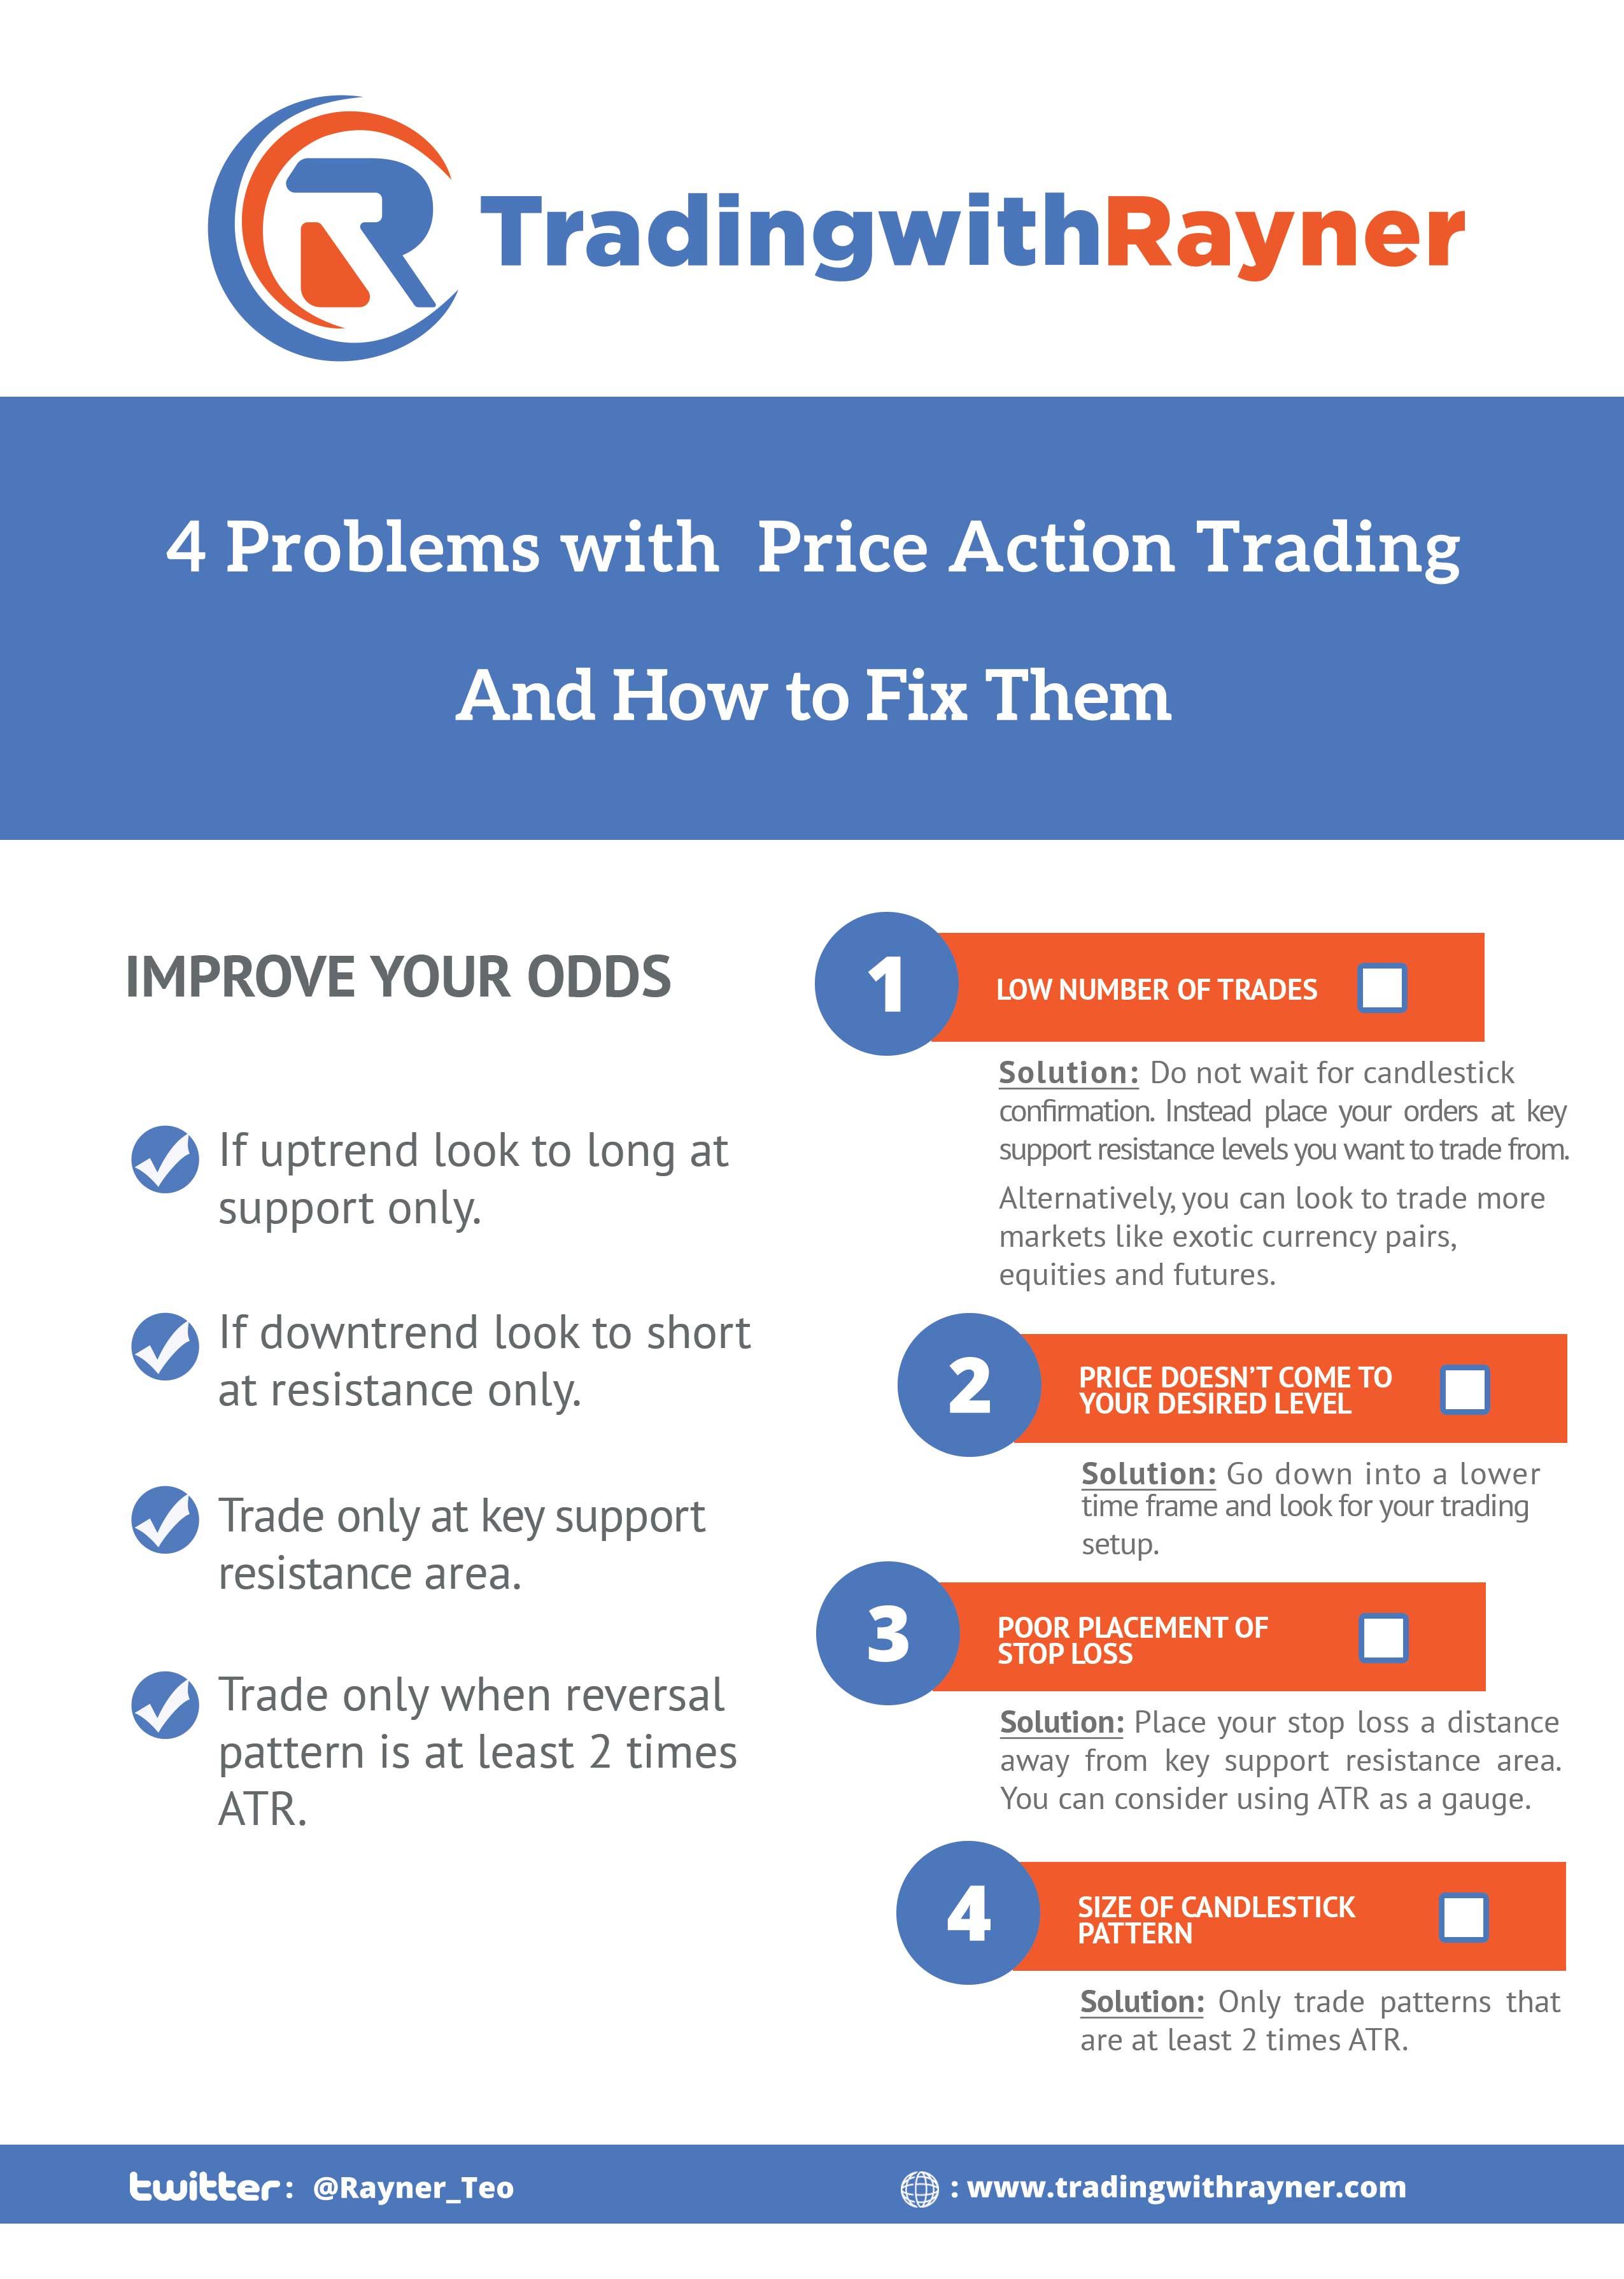 Price Price Action Trading